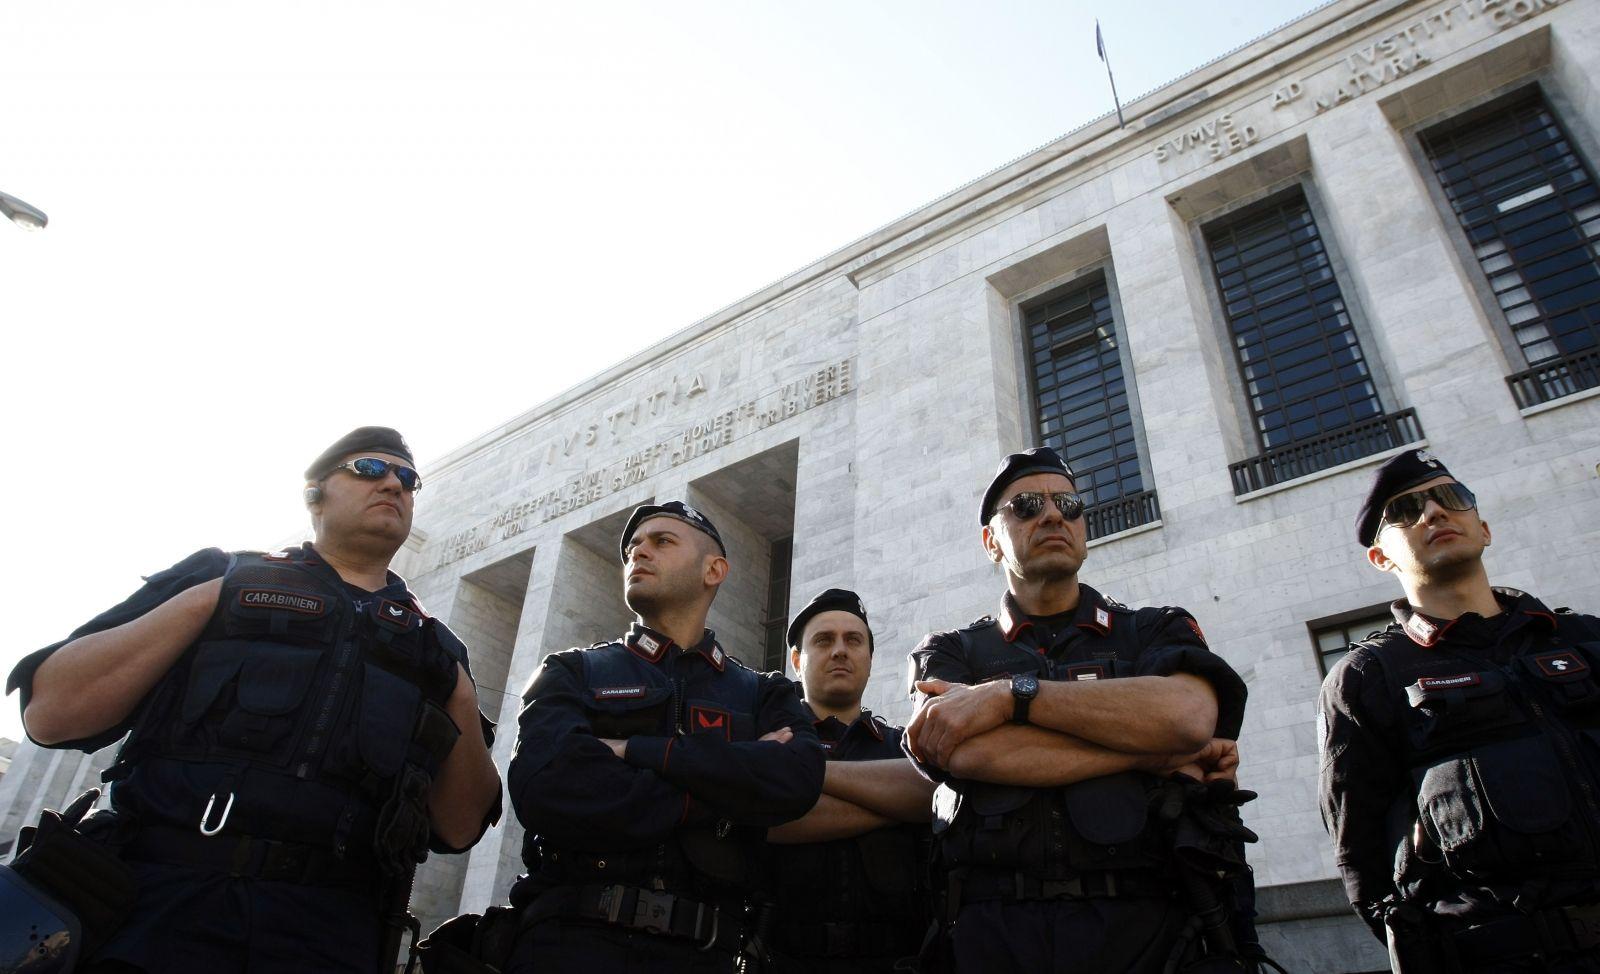 11 Italian Mafia members arrested